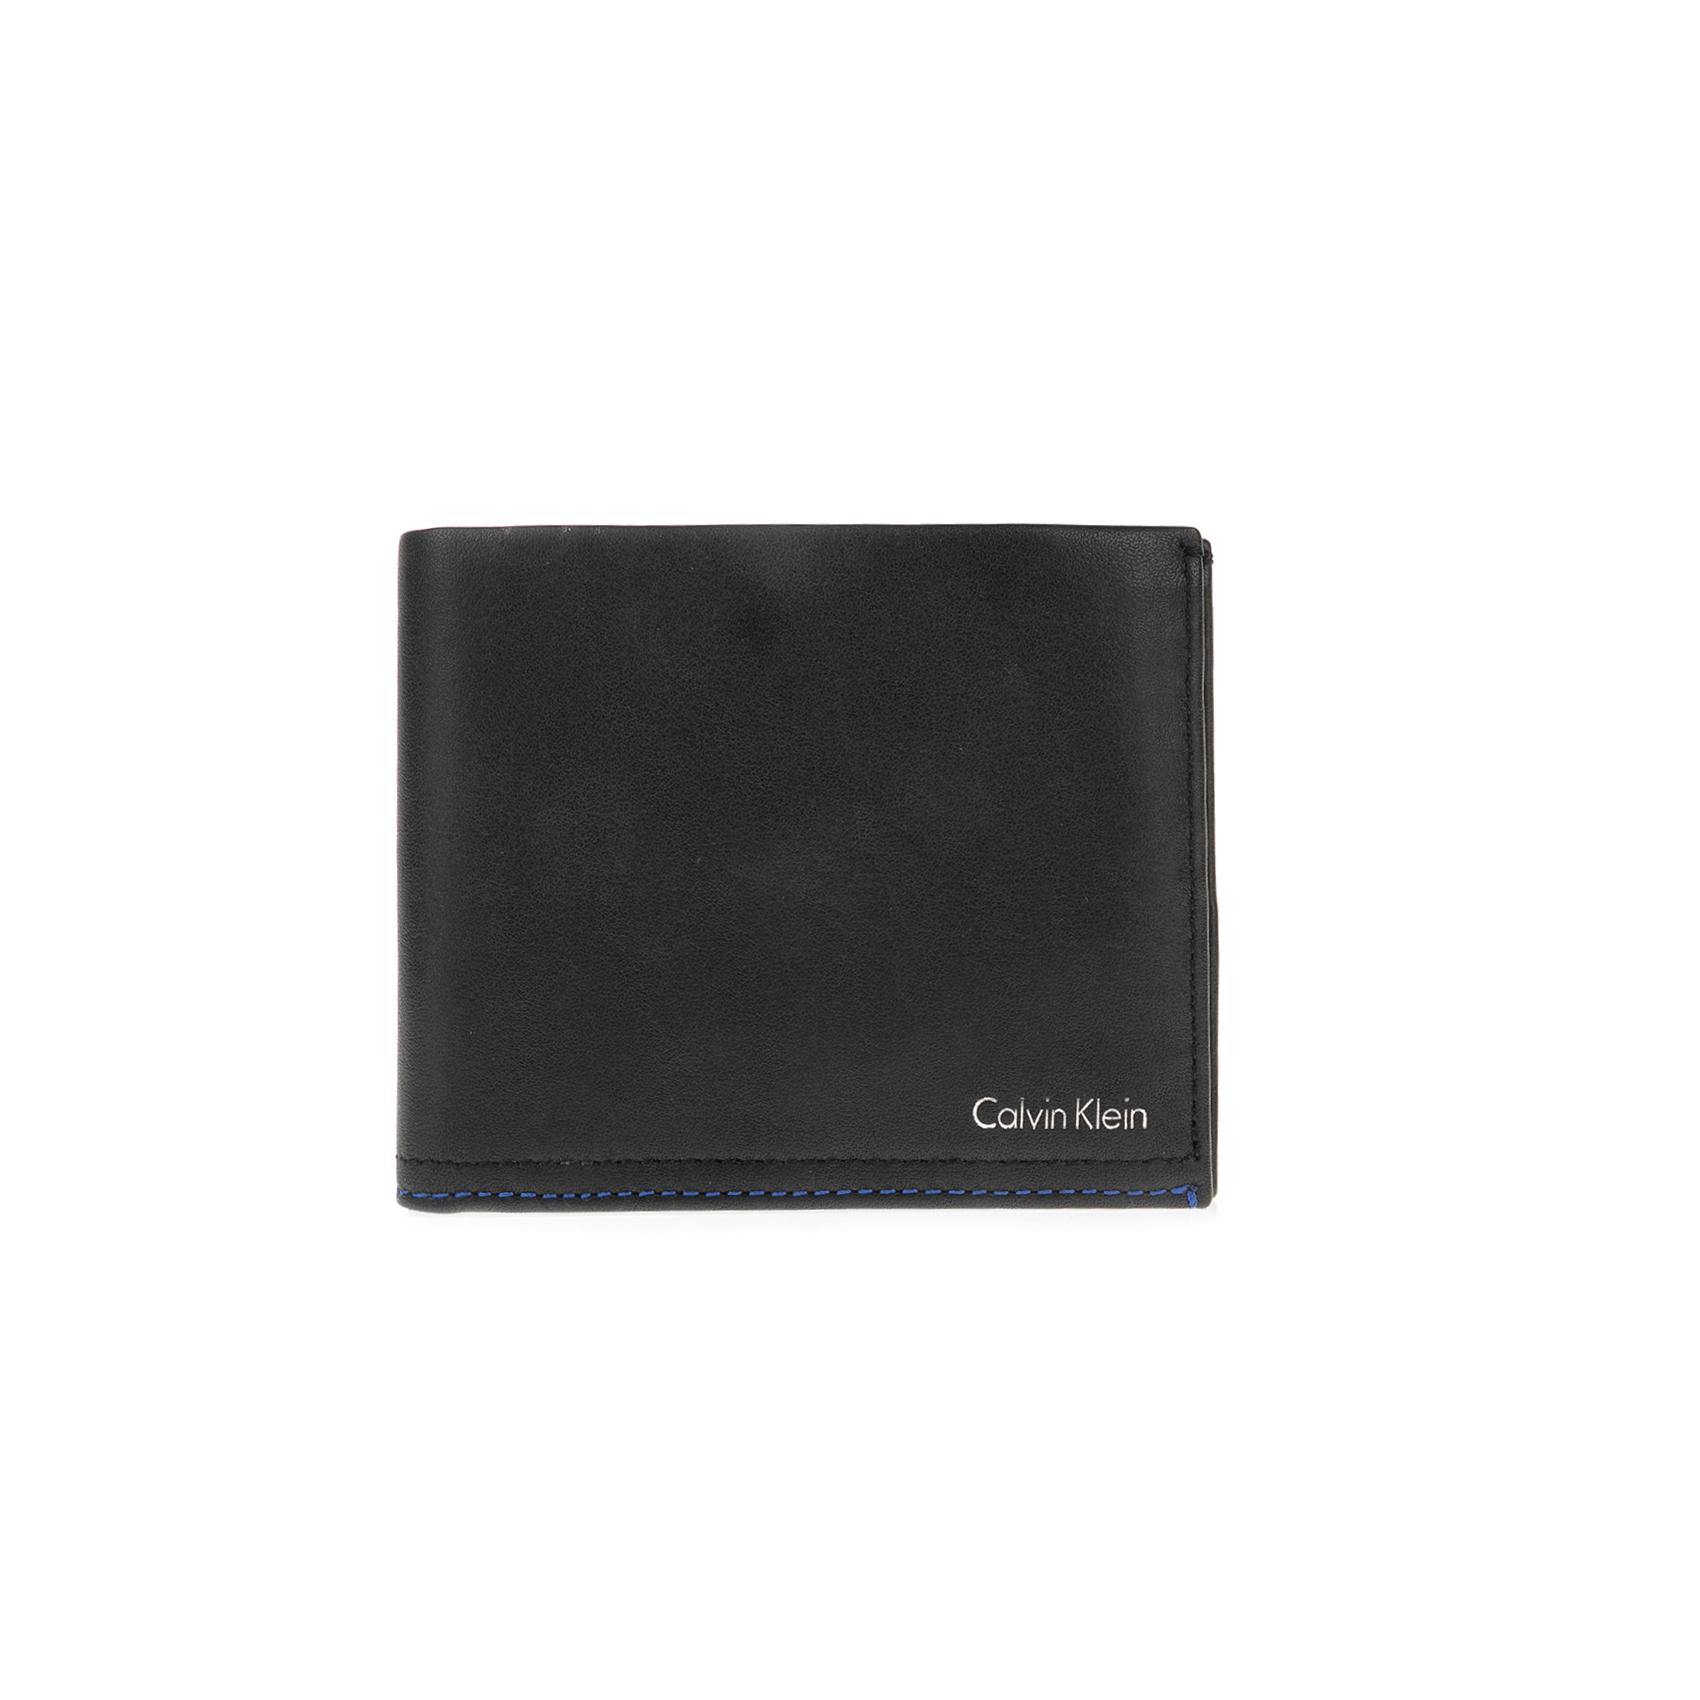 CALVIN KLEIN JEANS – Ανδρικό πορτοφόλι Calvin Klein Jeans μαύρο